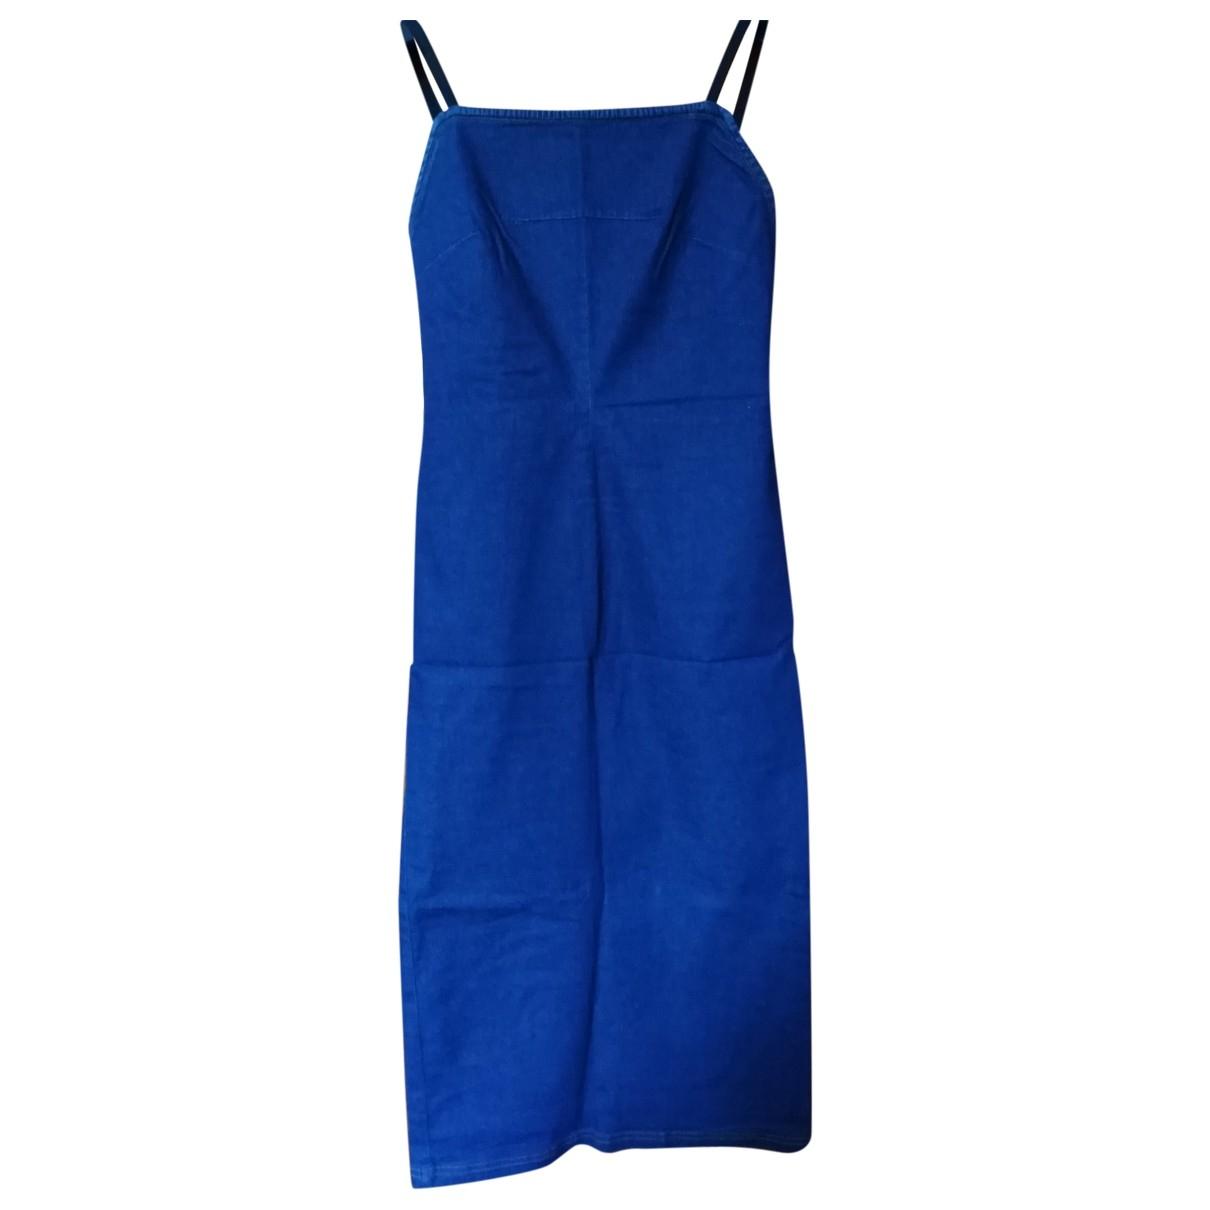 D&g - Robe   pour femme en denim - bleu